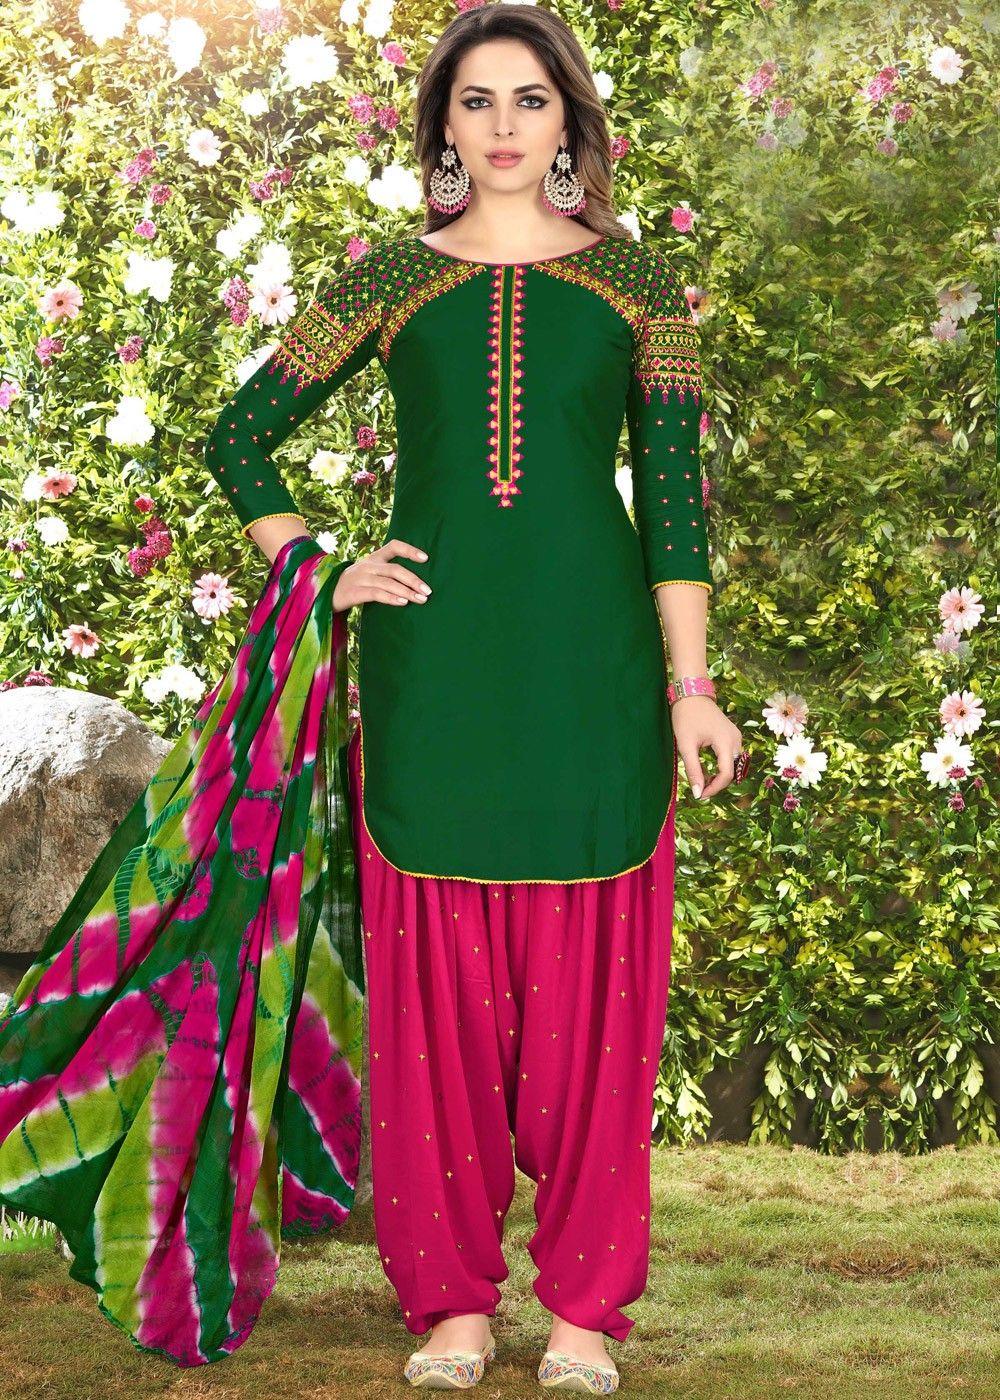 a865f4ebb0 Dark Green Cotton Punjabi Salwar Suit with Dupatta in 2019 | Latest ...